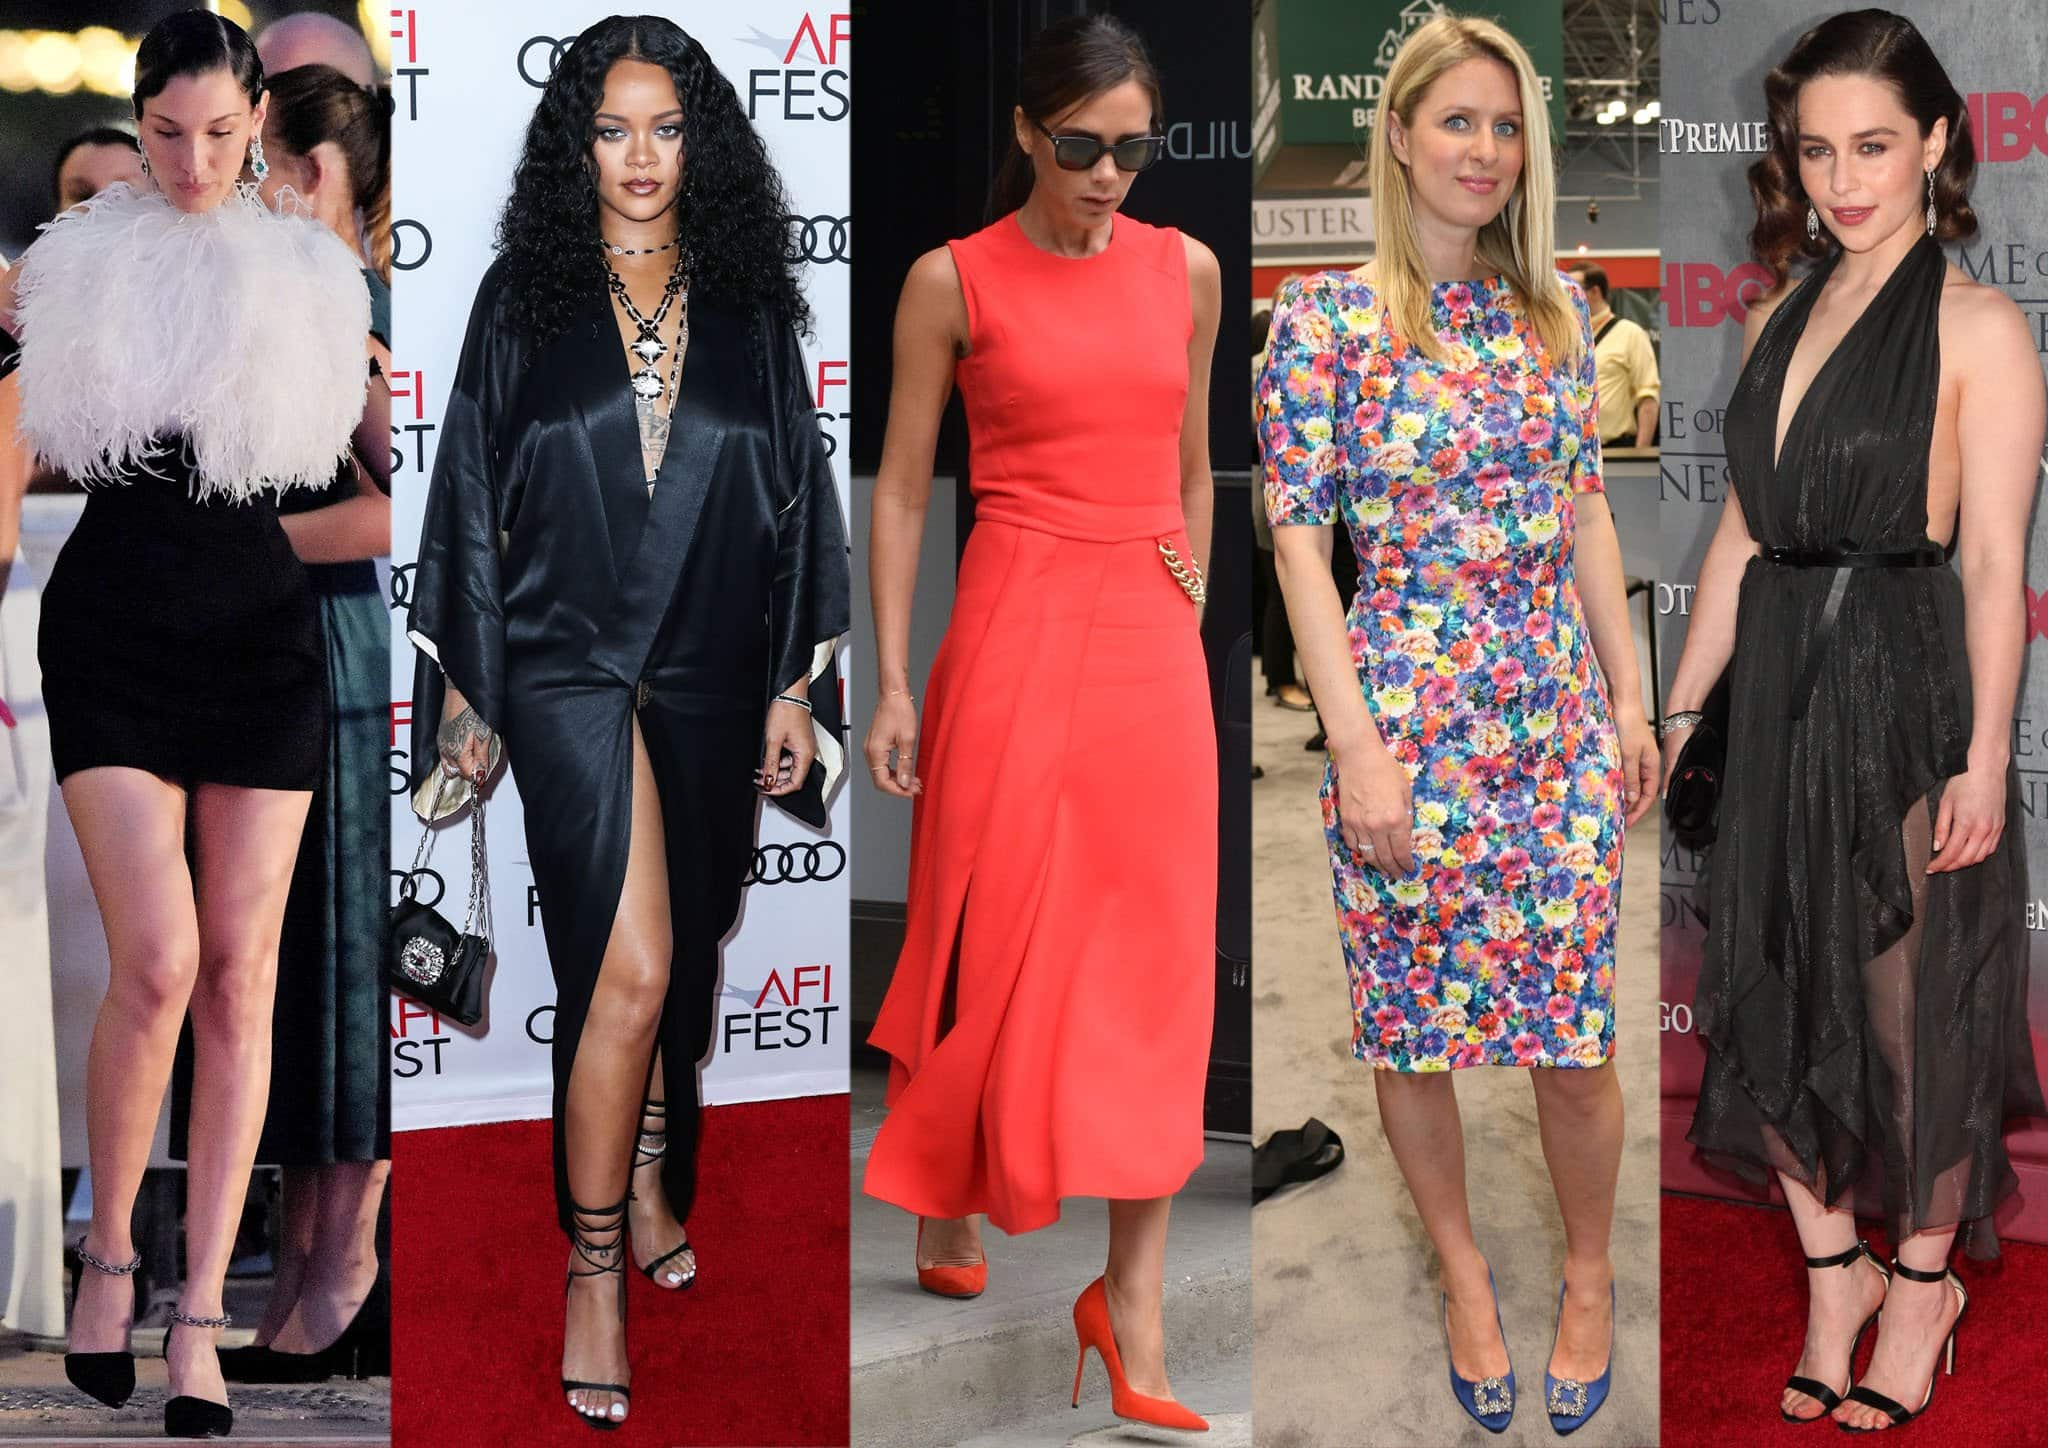 Bella Hadid, Rihanna, Victoria Beckham, Nicky Hilton, and Emilia Clarke pair their dress with Manolo Blahnik shoes